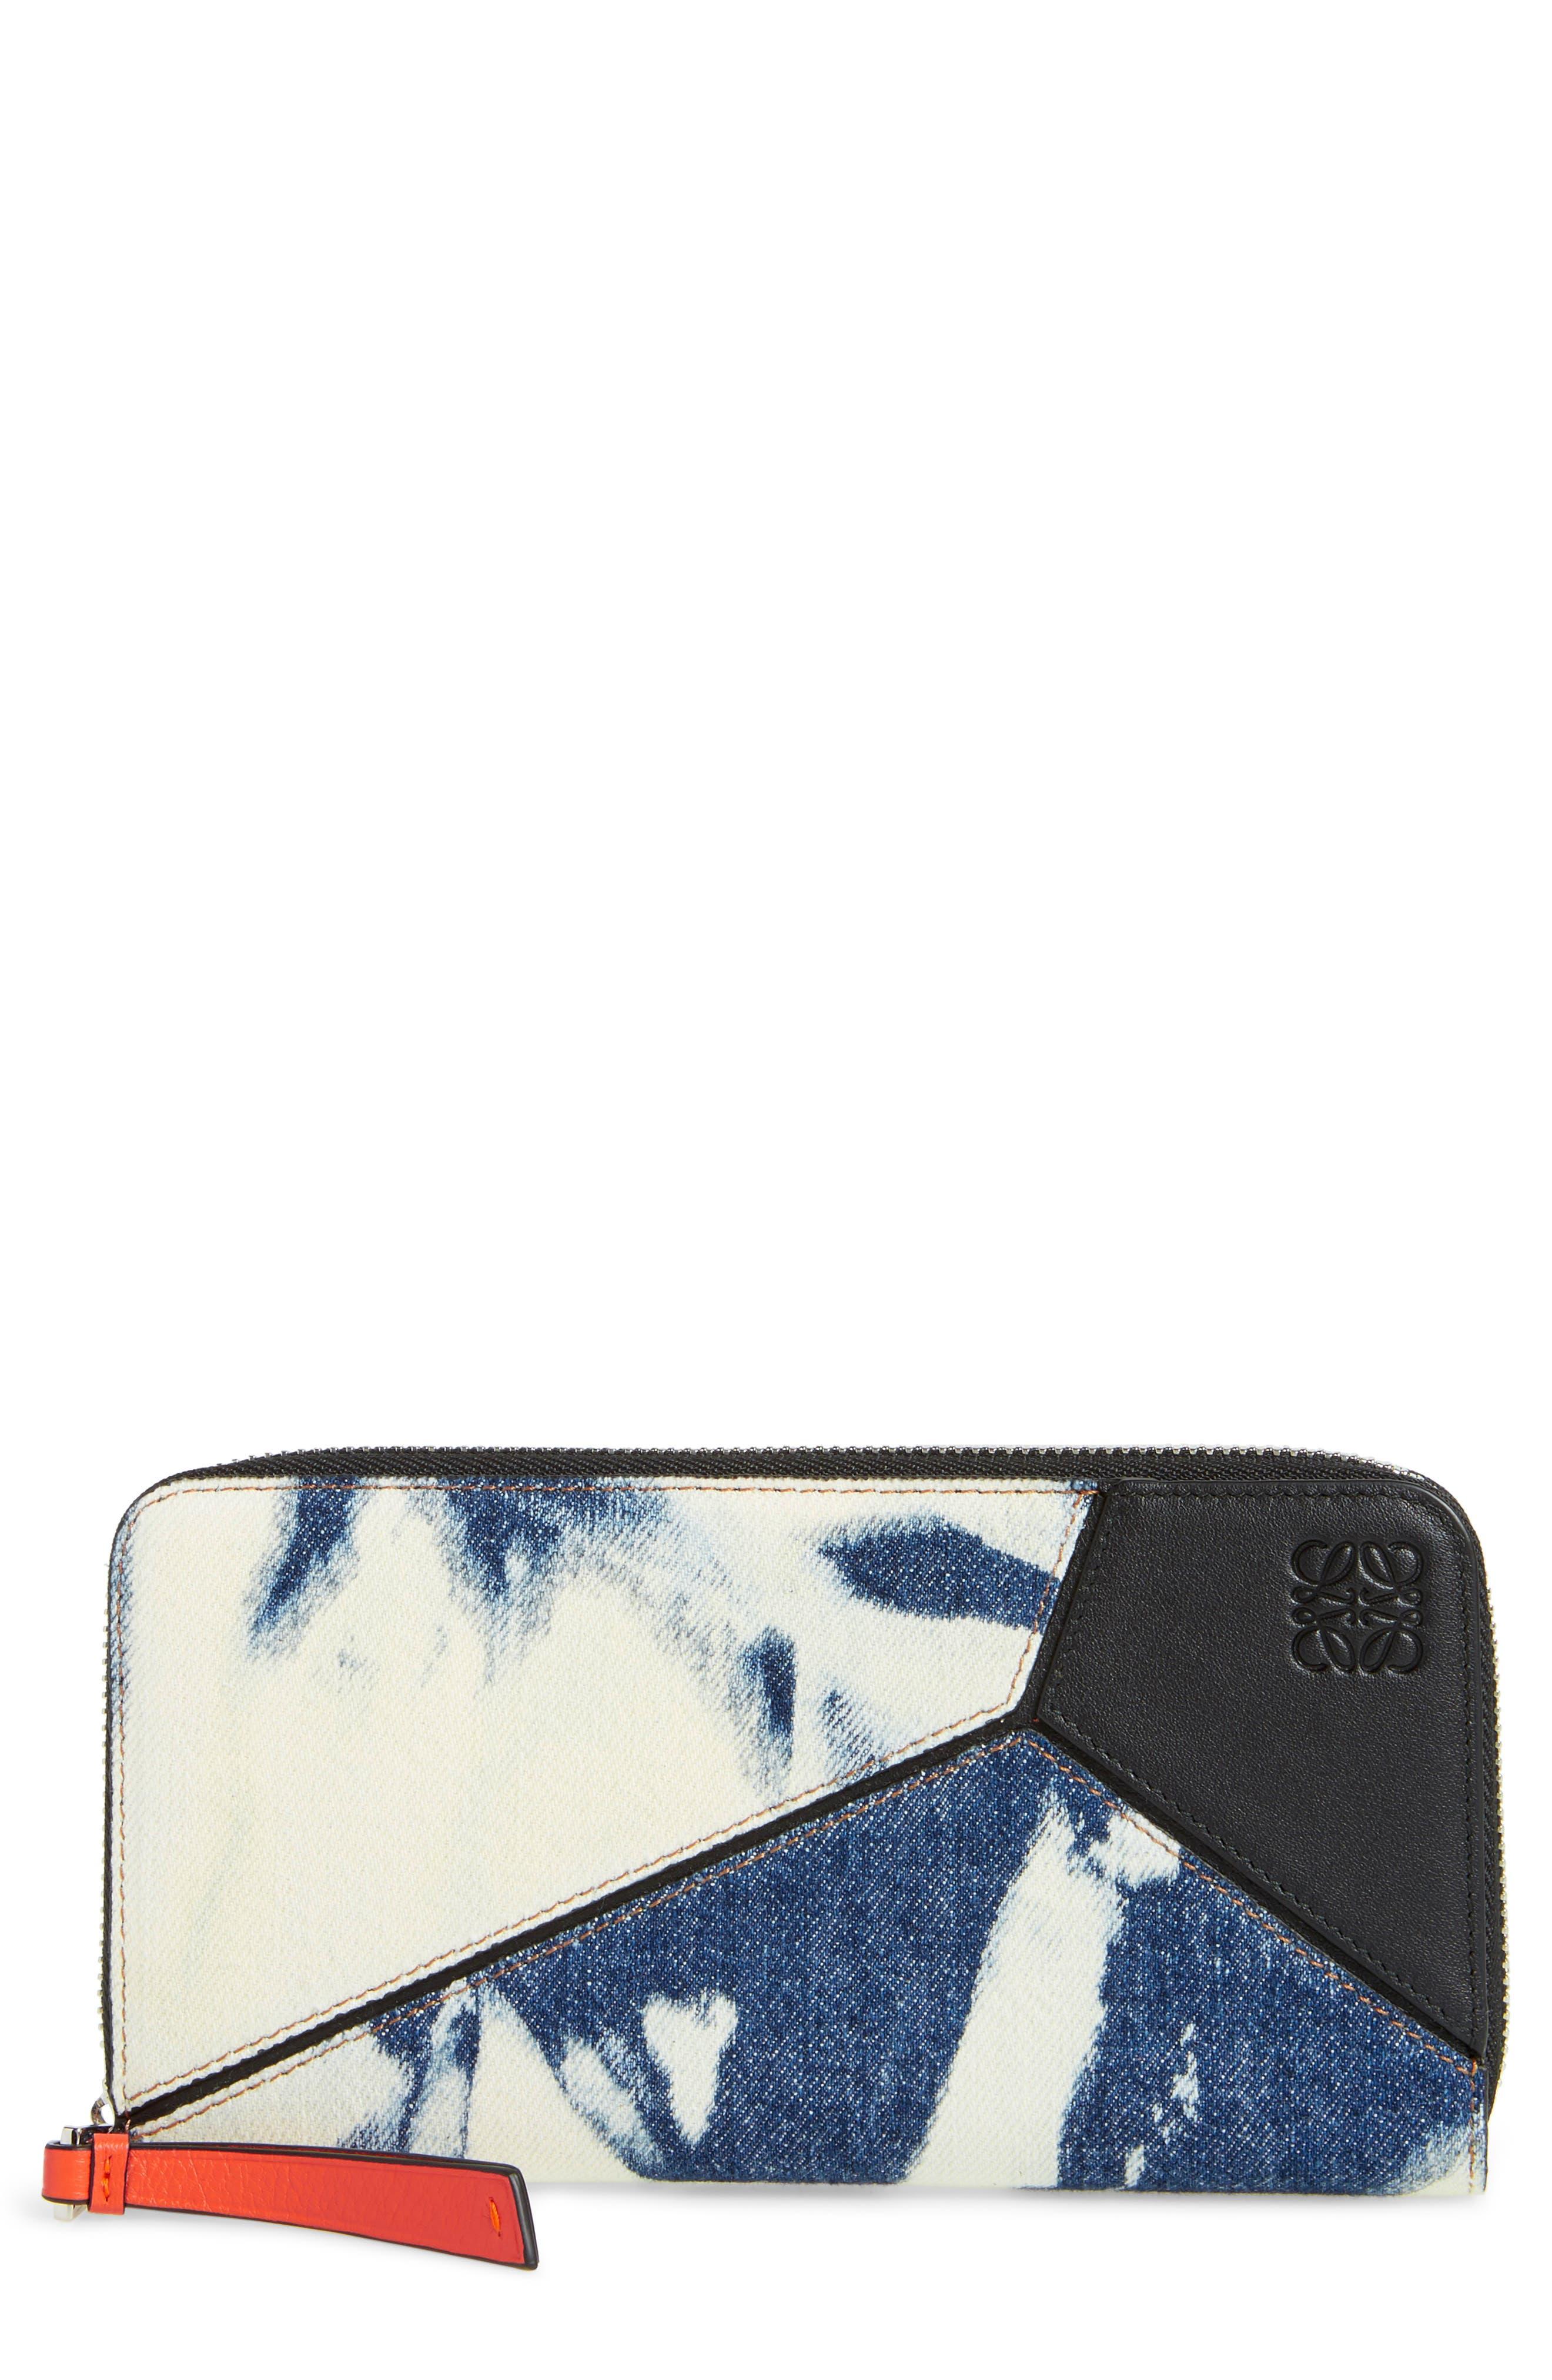 Denim Puzzle Zip Around Leather Wallet,                         Main,                         color, Blue Denim/ White/ Black